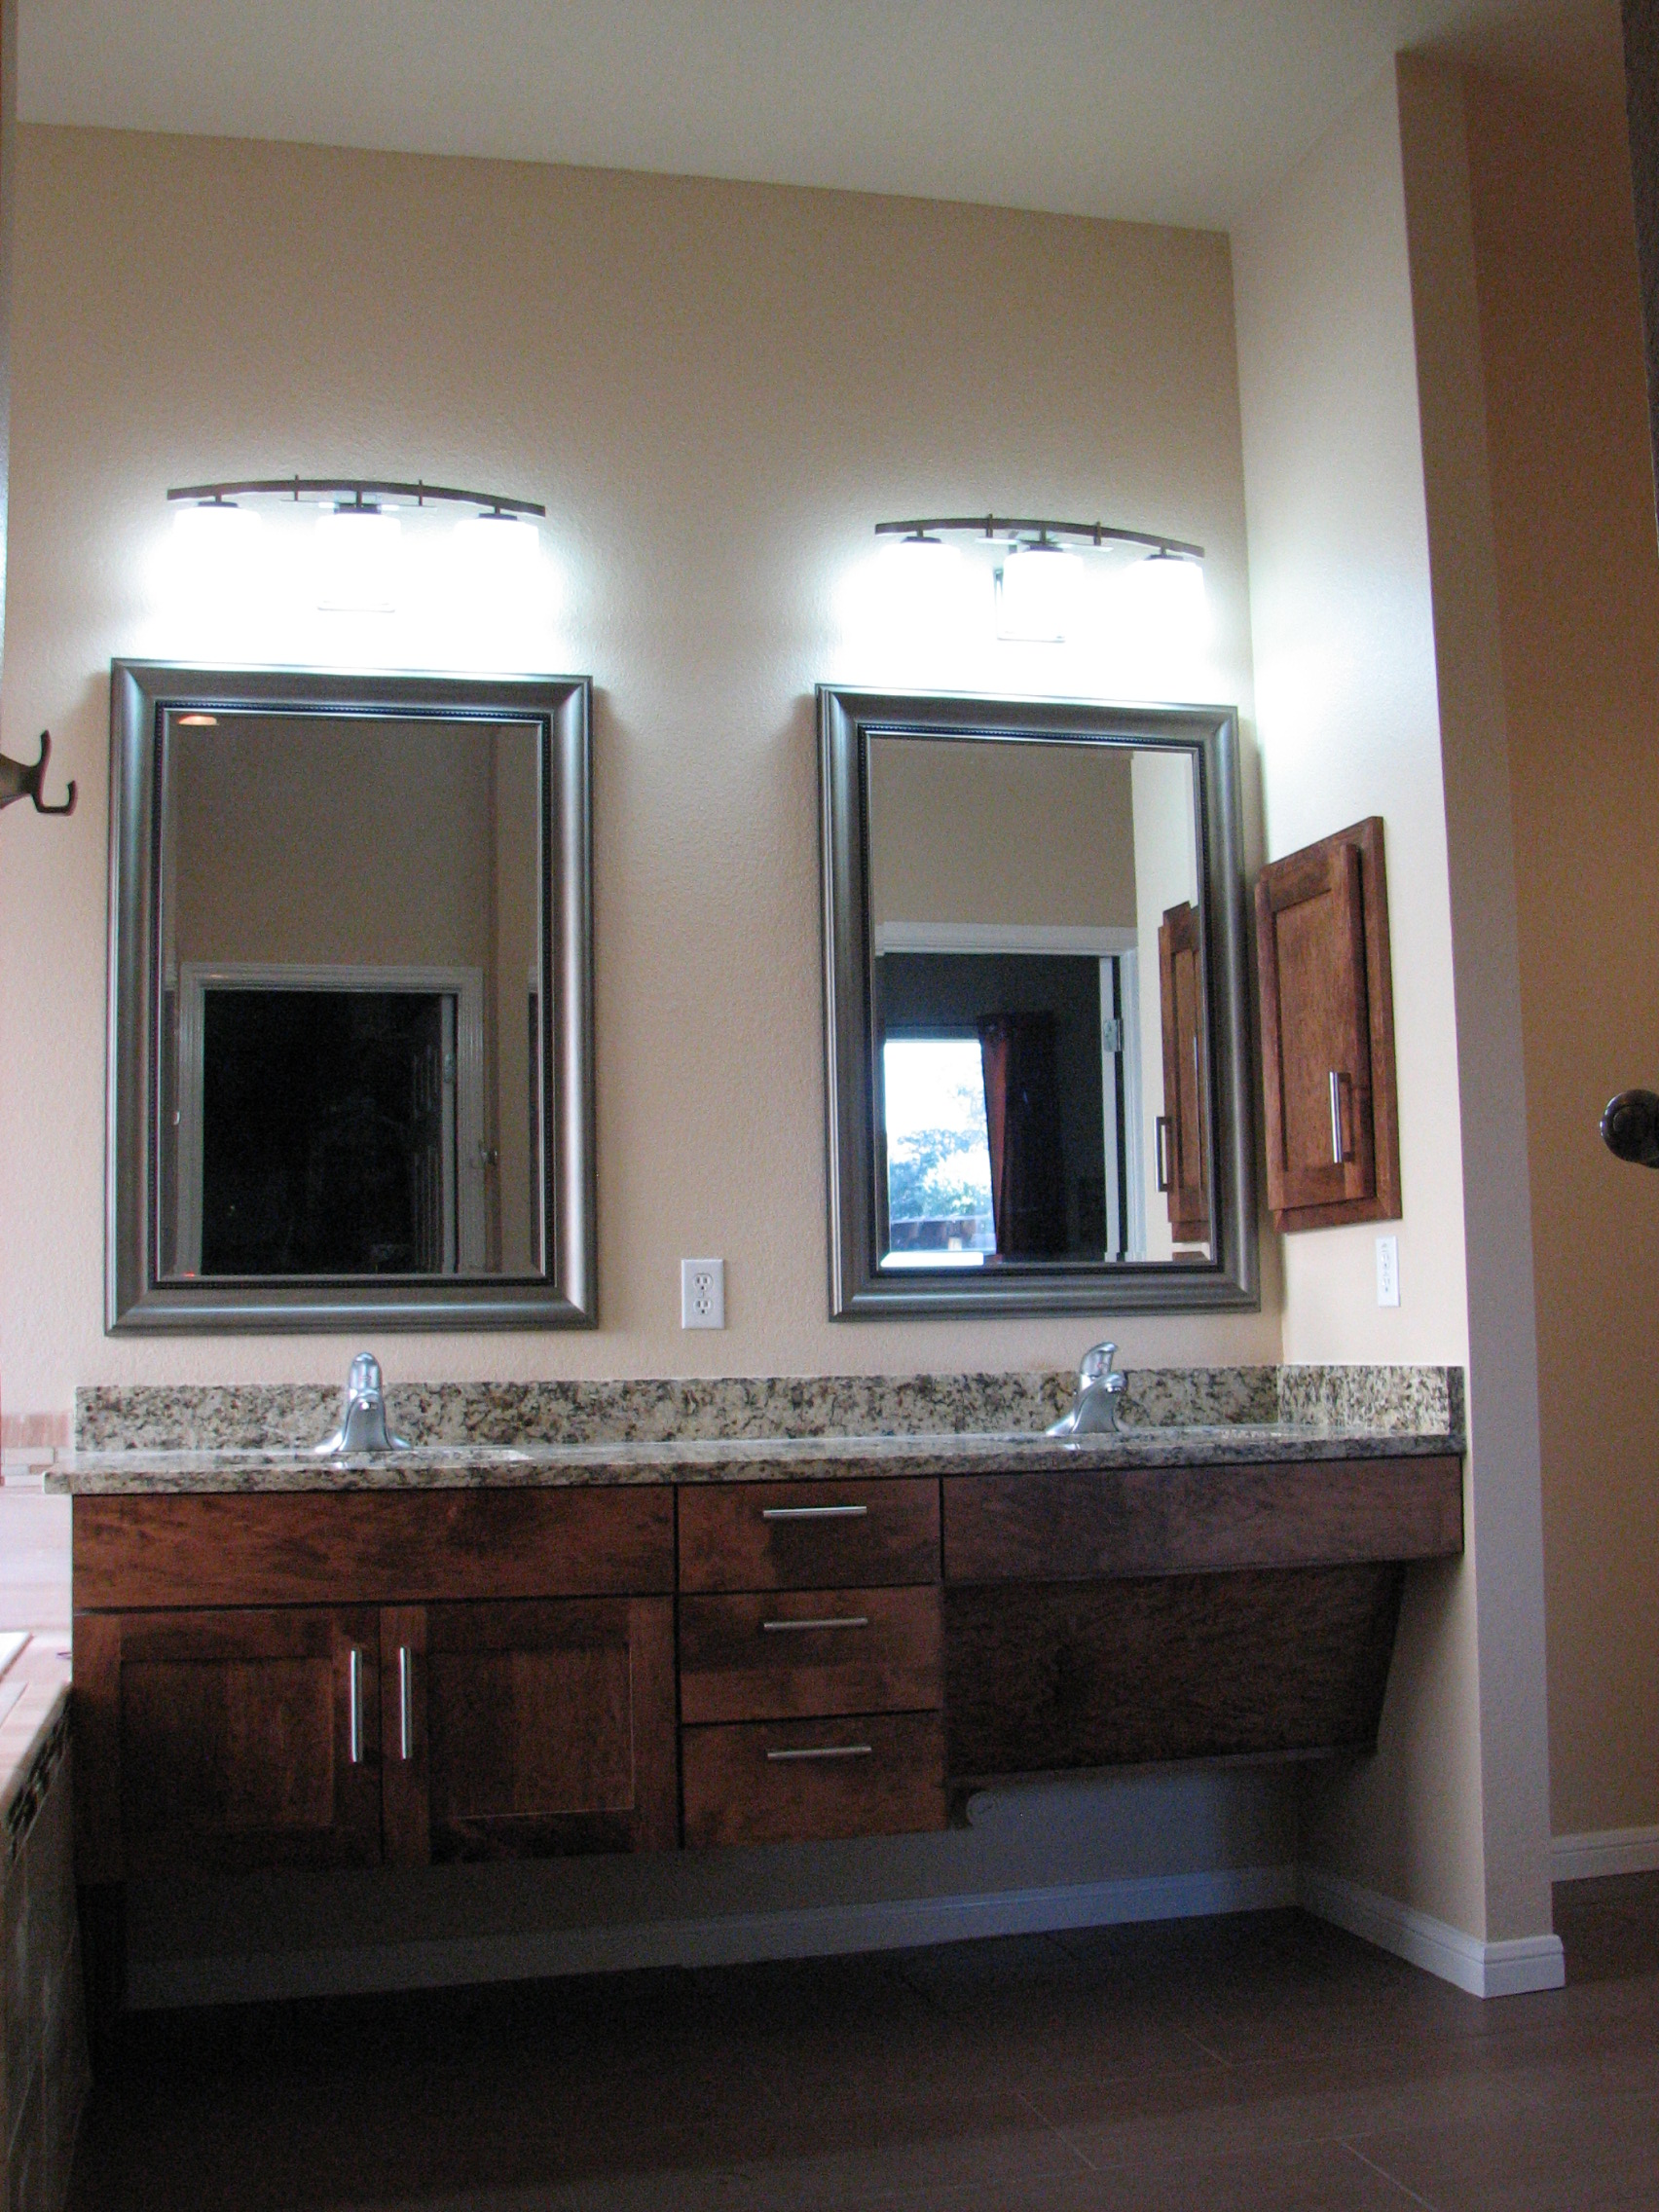 Image of: Ada Compliant Bathroom Vanity